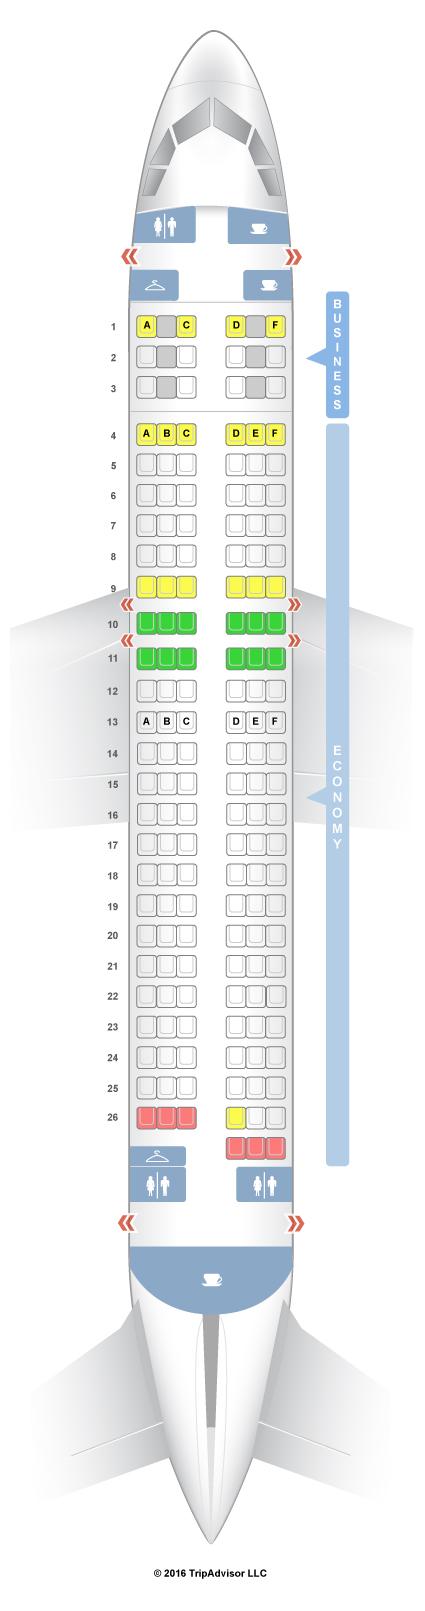 spirit seat chart - Hunthankk